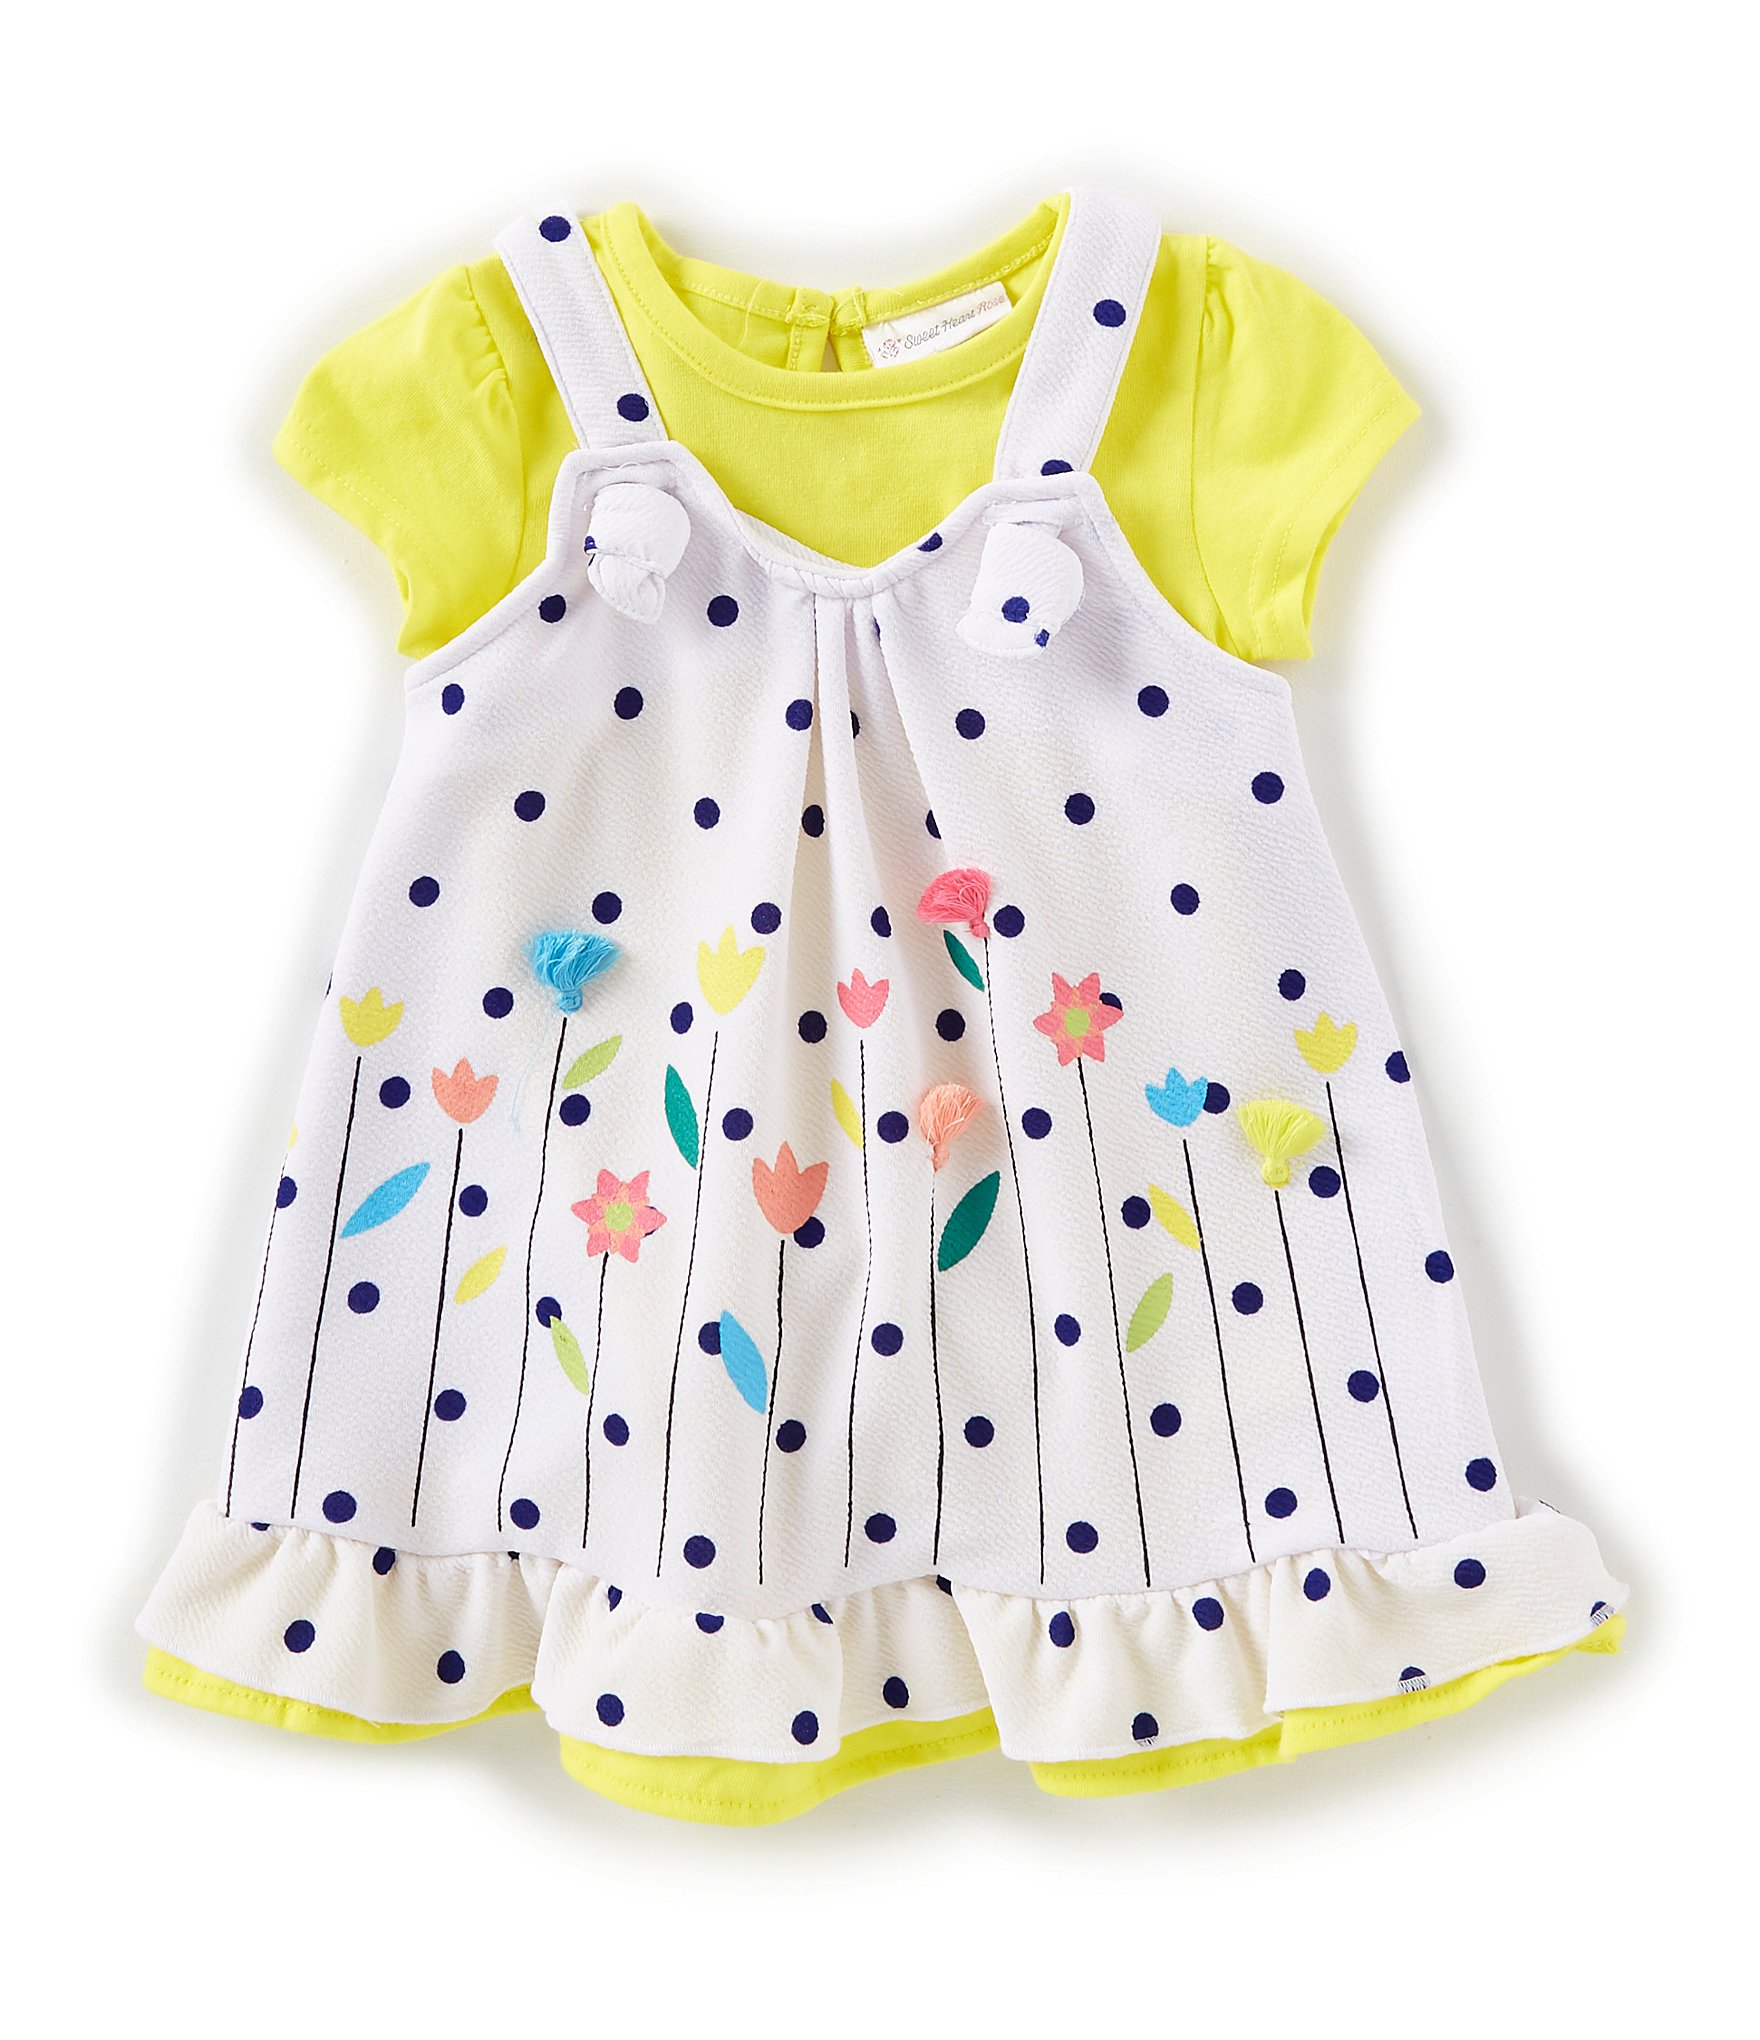 bac48fef9 Sale   Clearance Baby Girl Dresses